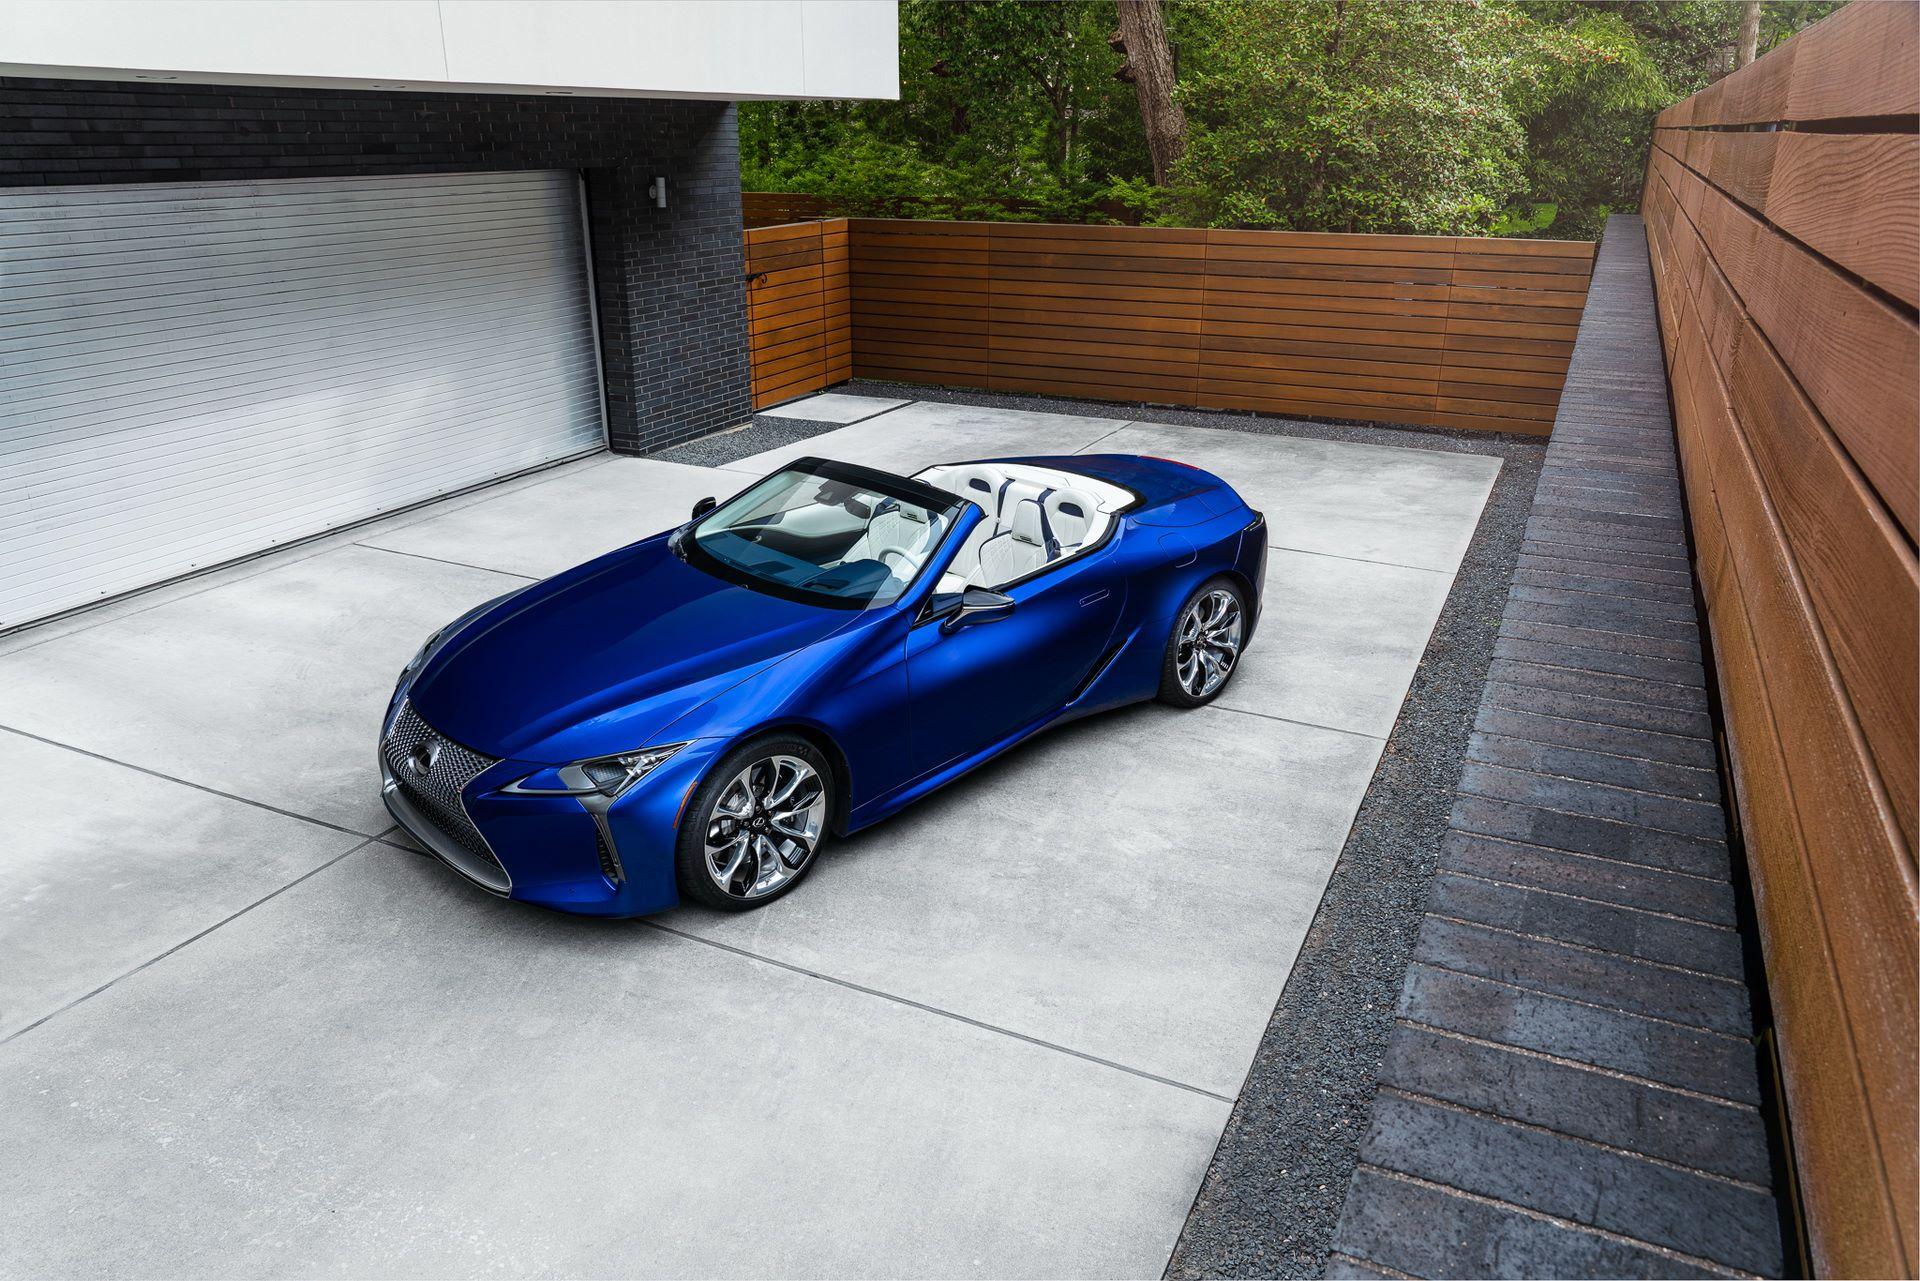 Lexus-LC-500-Convertible-Regatta-Edition-1